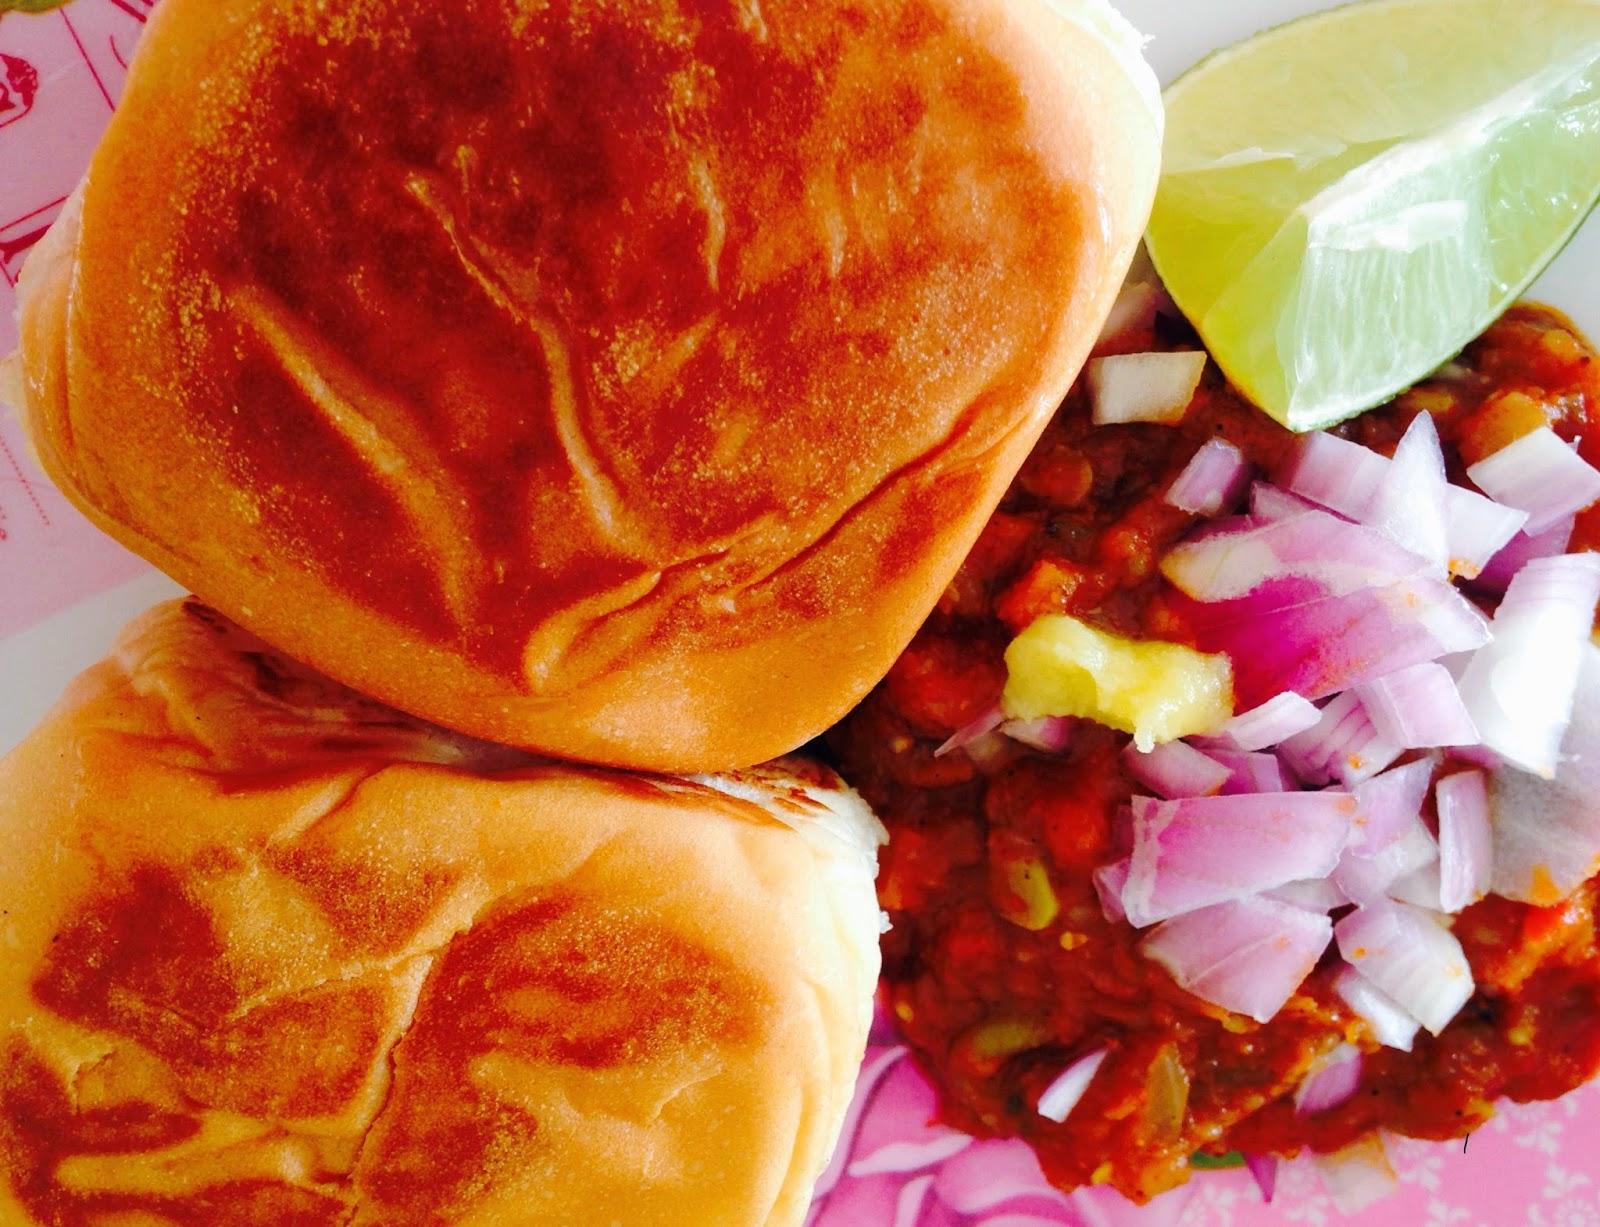 pav bhaji with lemon and onions